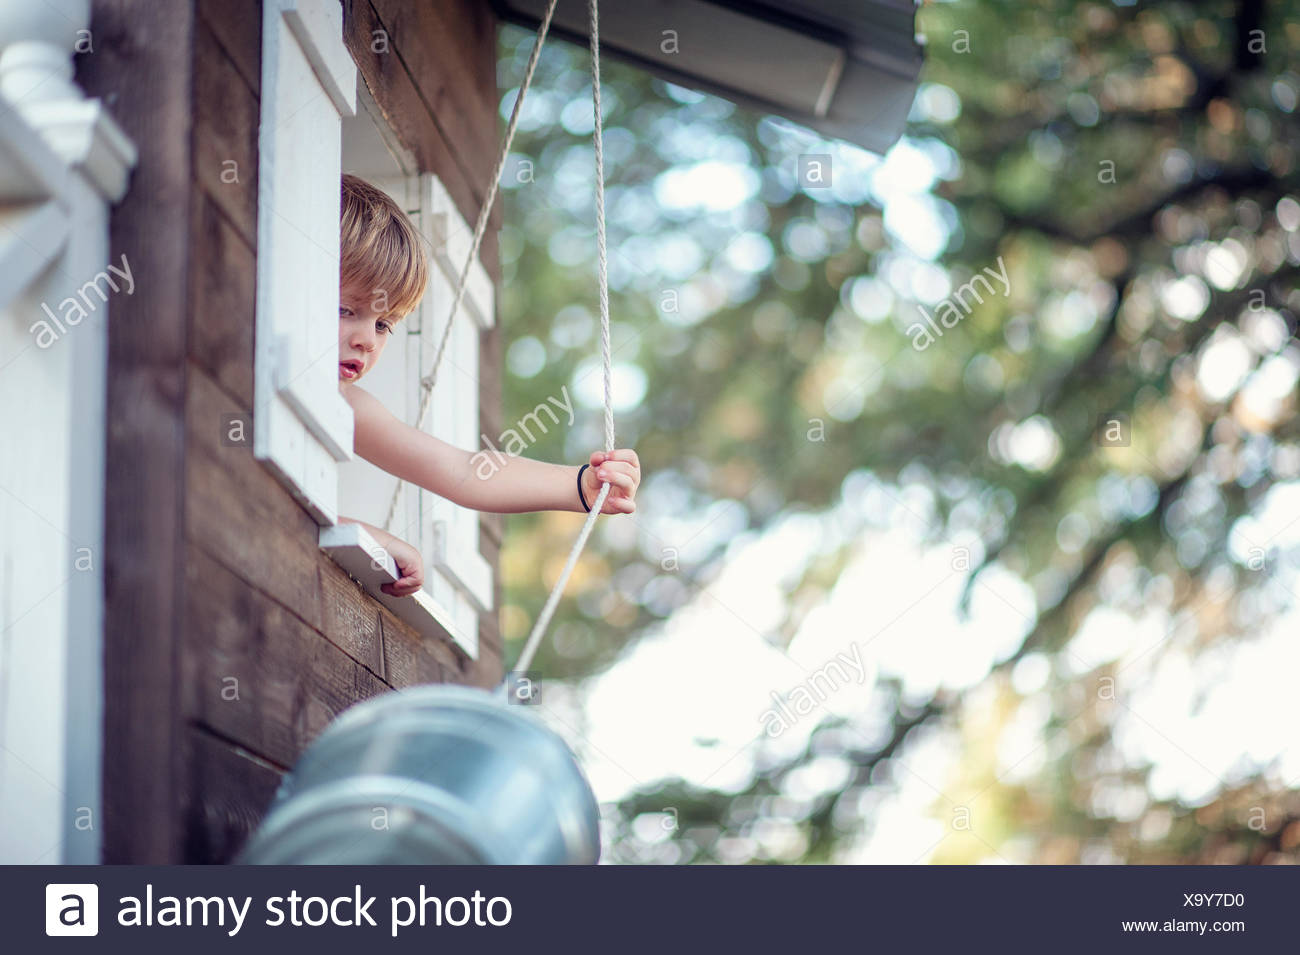 Garçon tirant un seau jusqu'à sa cabane Photo Stock